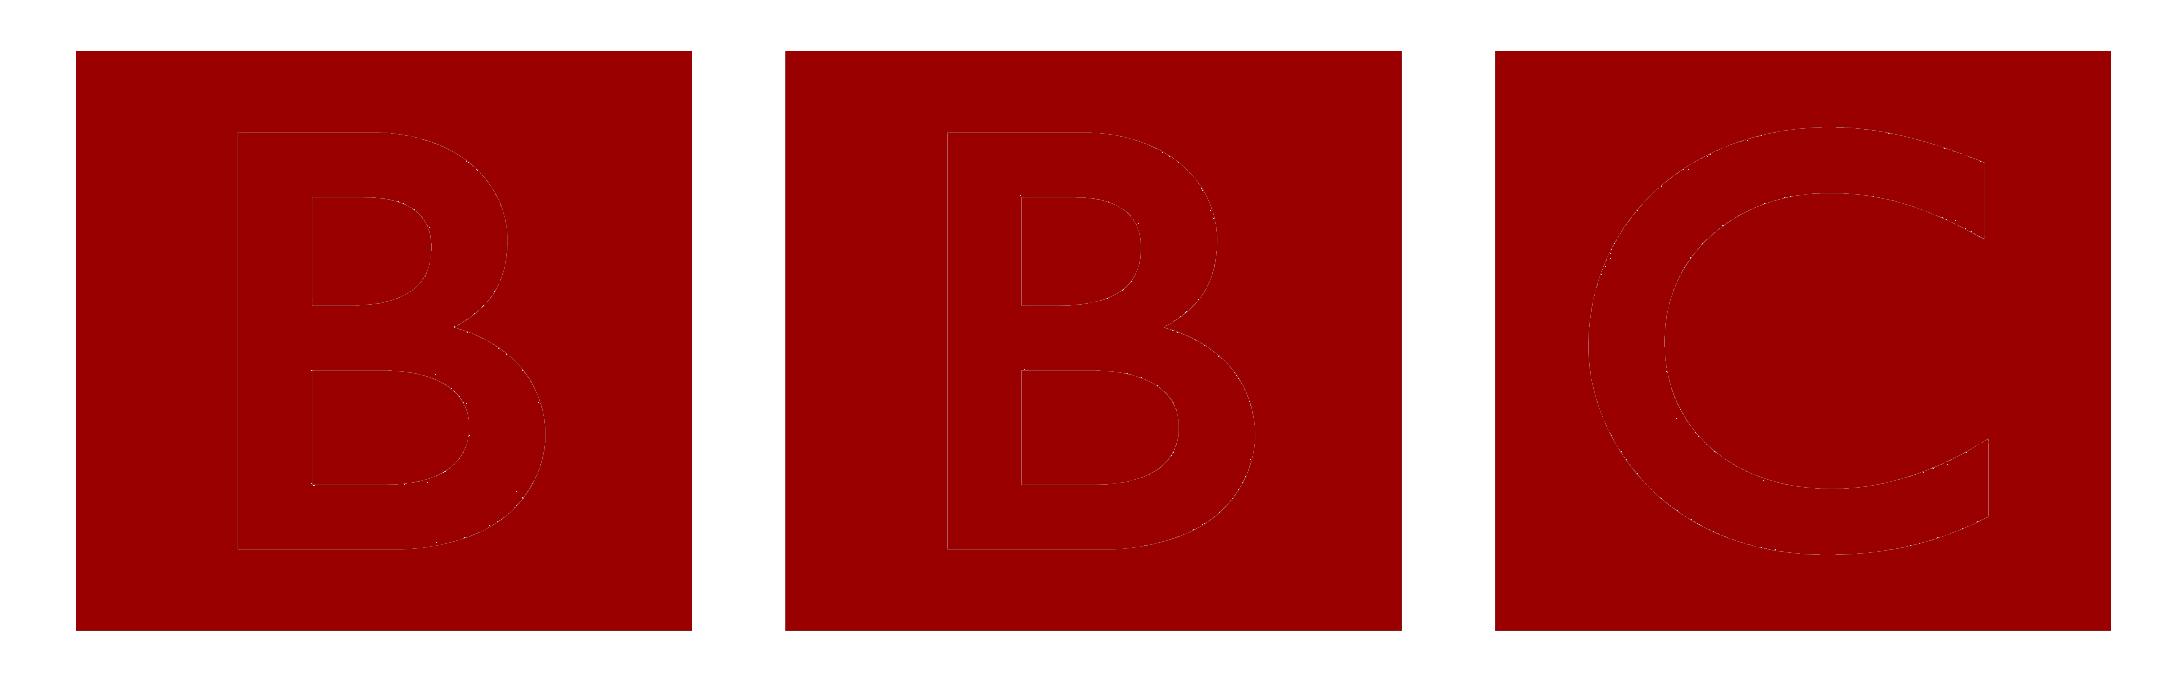 Bbc logo clipart clip art library library Download Option Logo Ltd Bbc Safety Pepsi 1St Clipart PNG Free ... clip art library library